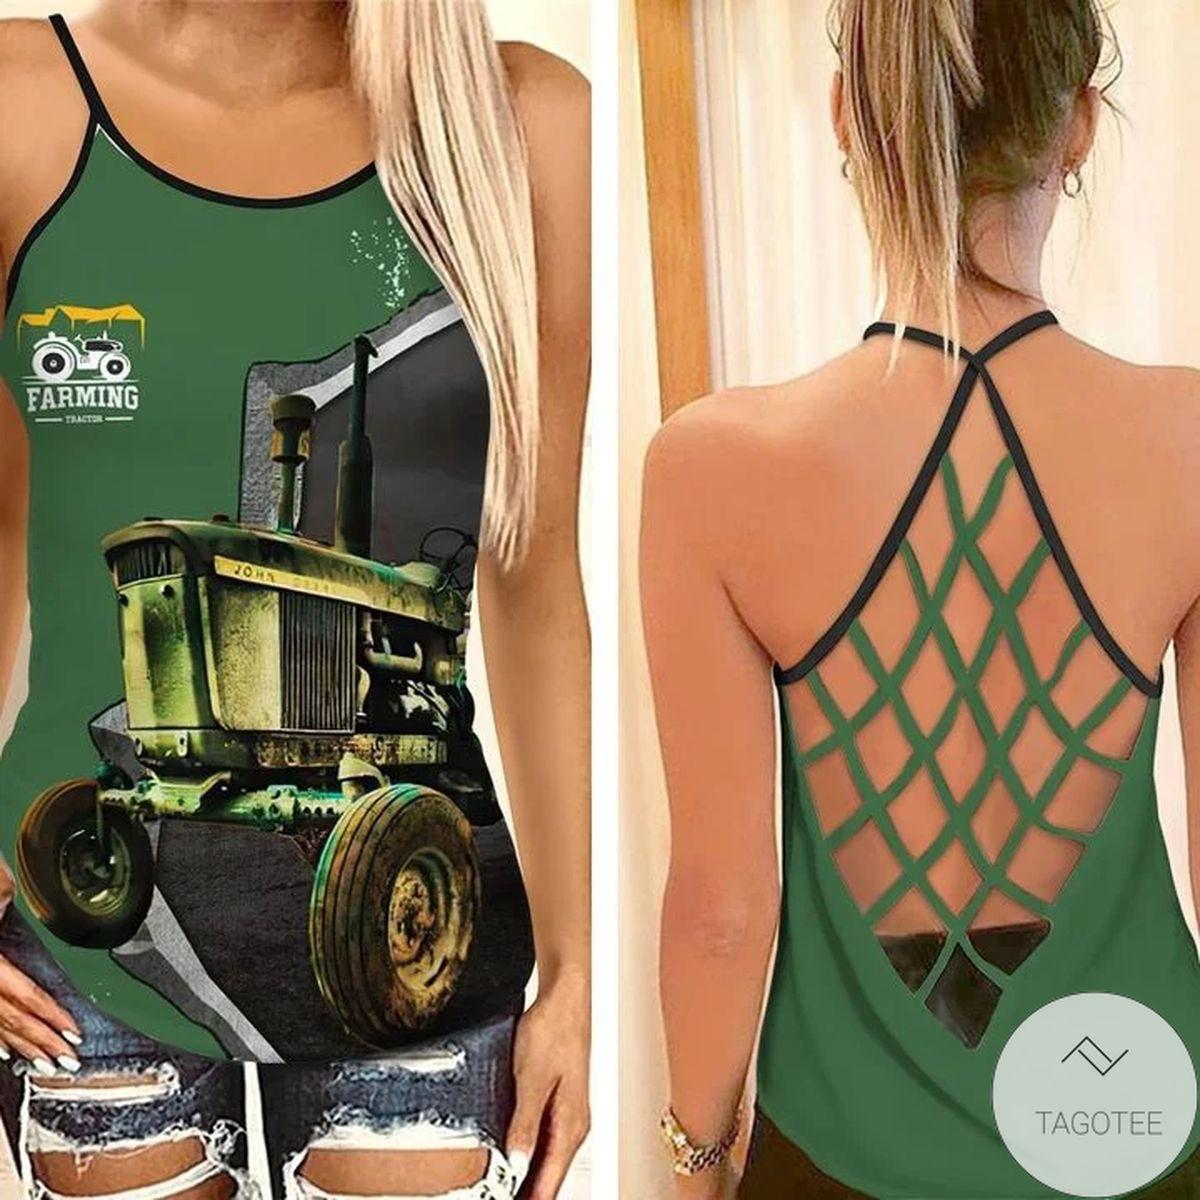 John Deere Tractor Farming Criss Cross Tank Top